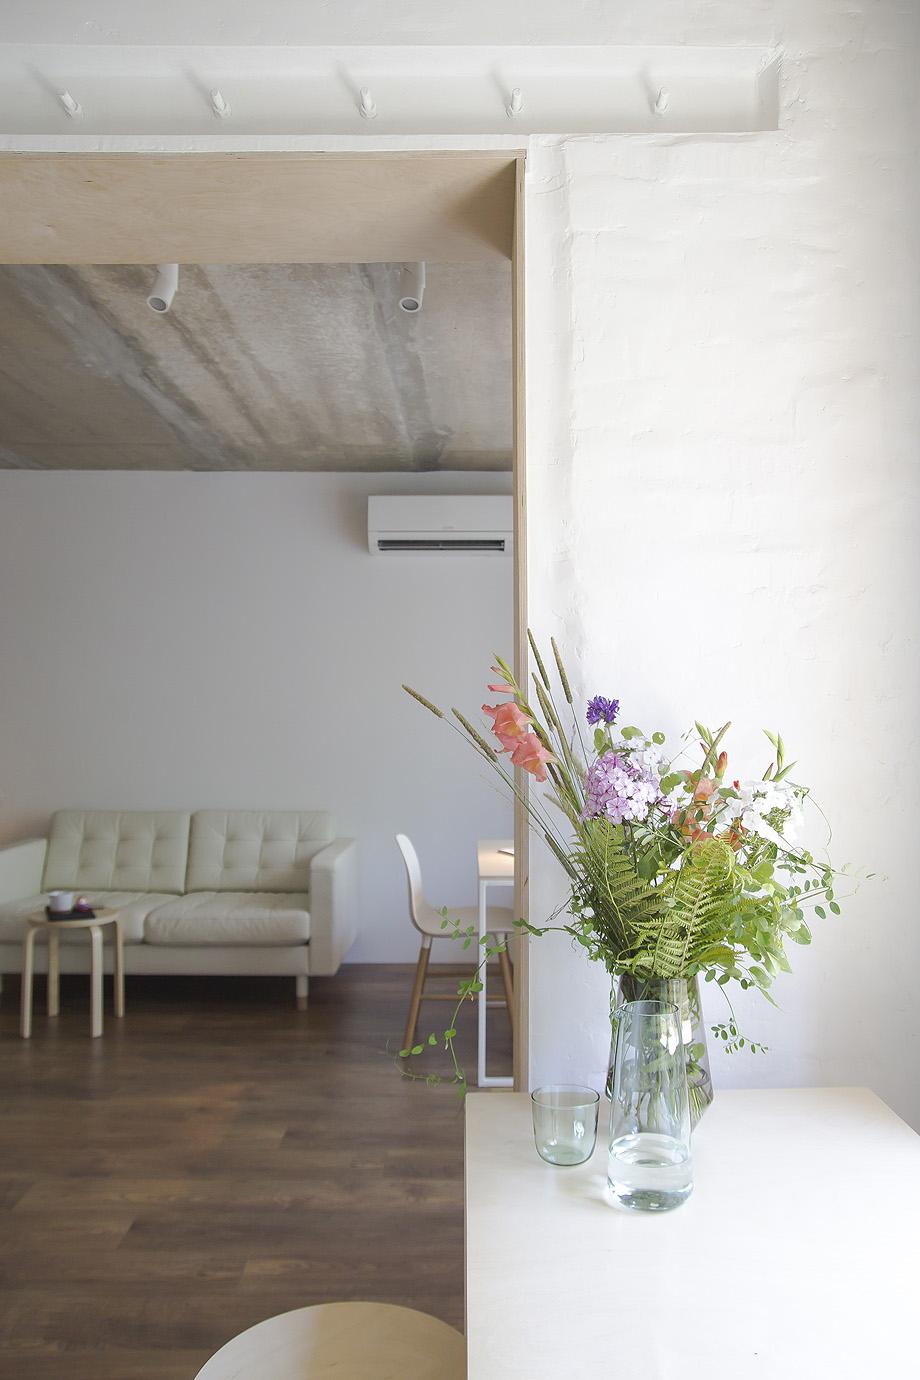 apartamento en rusia por kdva architects - foto daria koloskova (7)